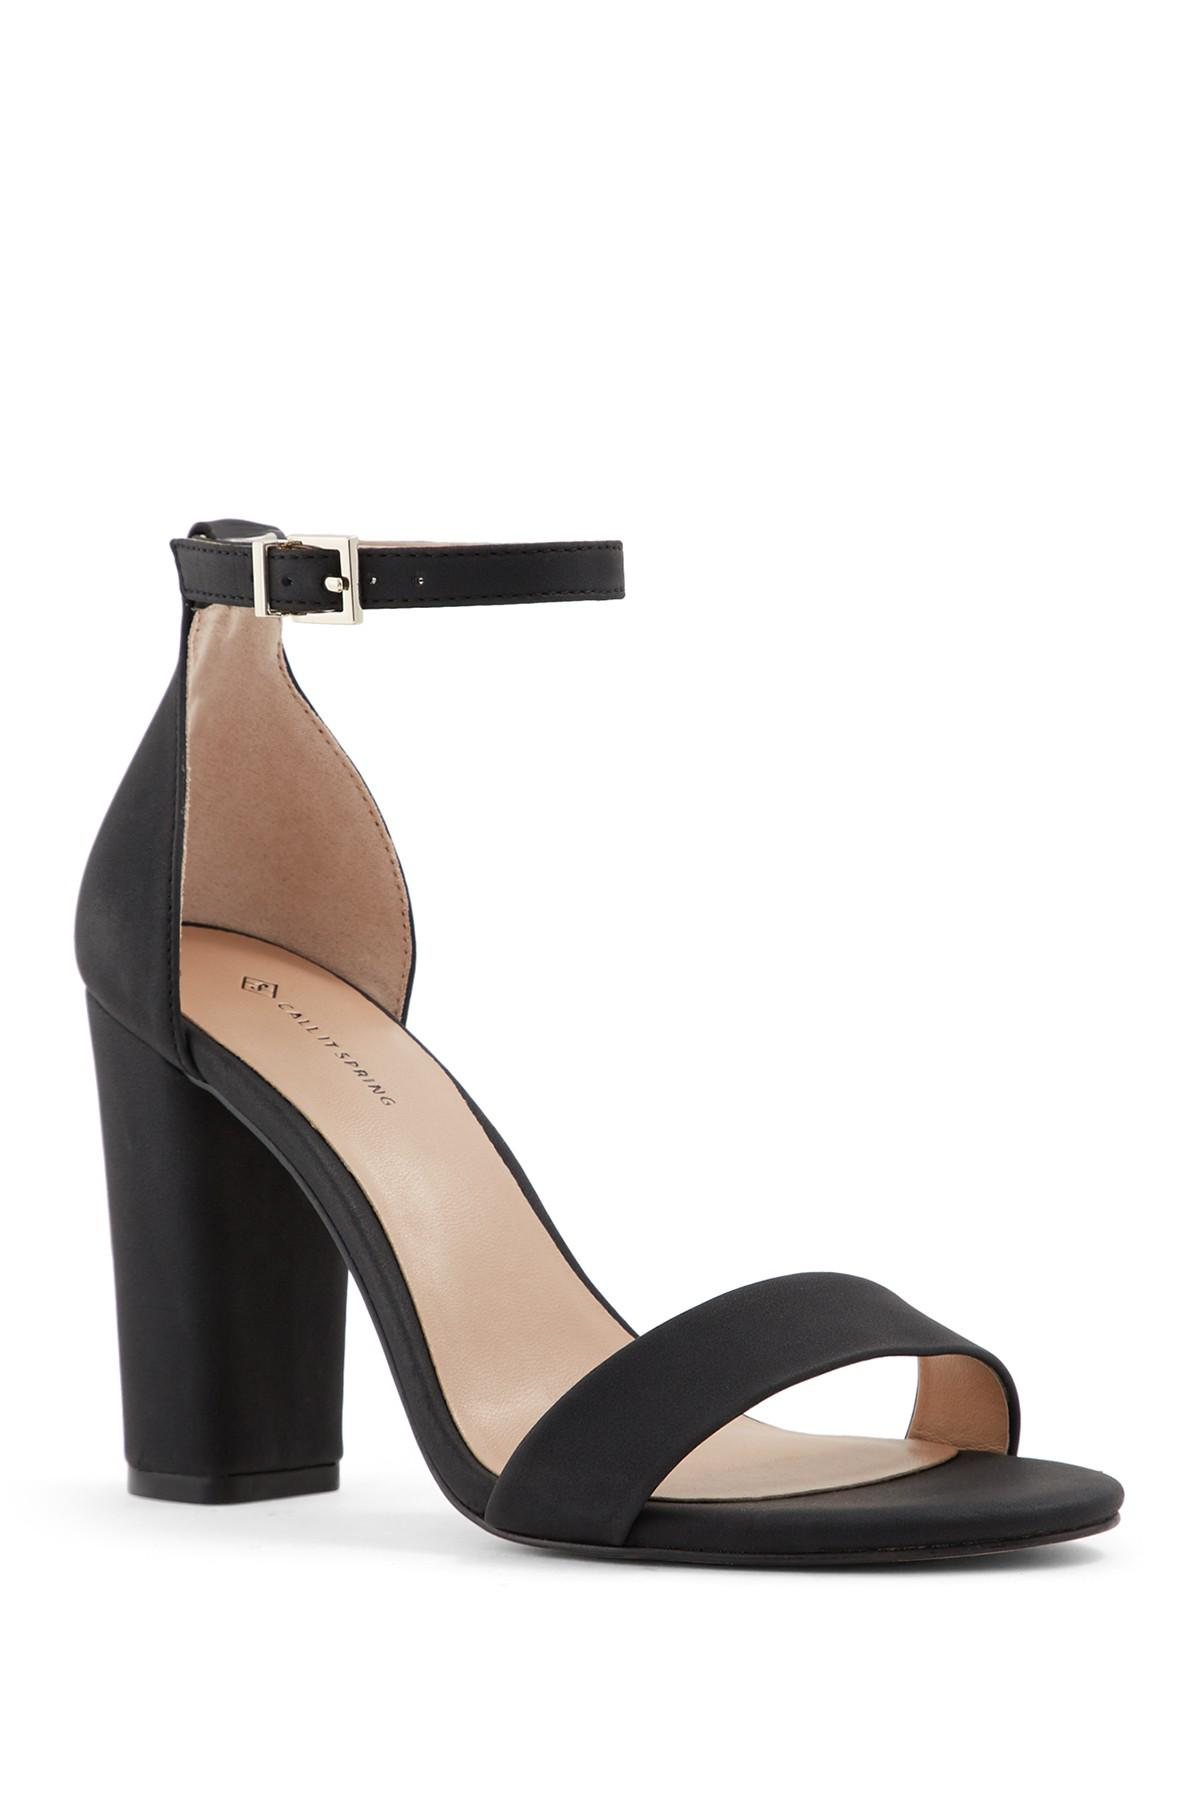 ab90f9cb49 Call It Spring Tayvia Block Heel Sandal in Black - Lyst